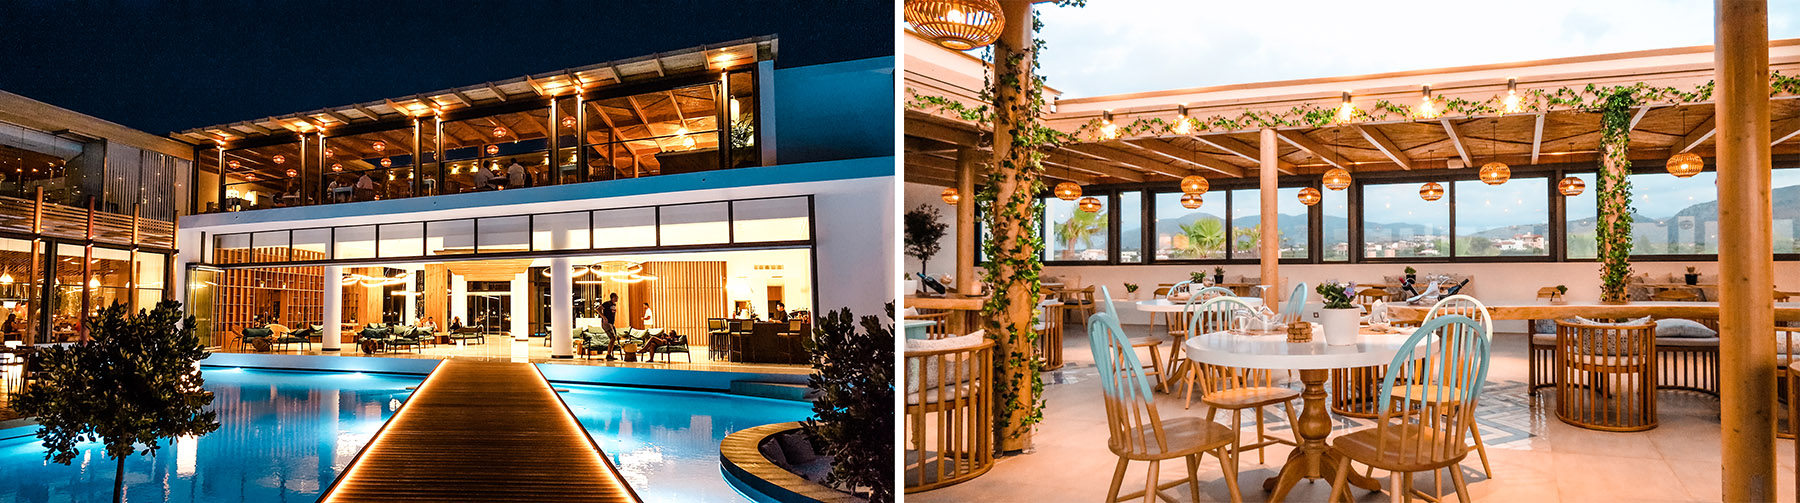 Stella Island Luxury Resort Kreta Lobby Restaurant